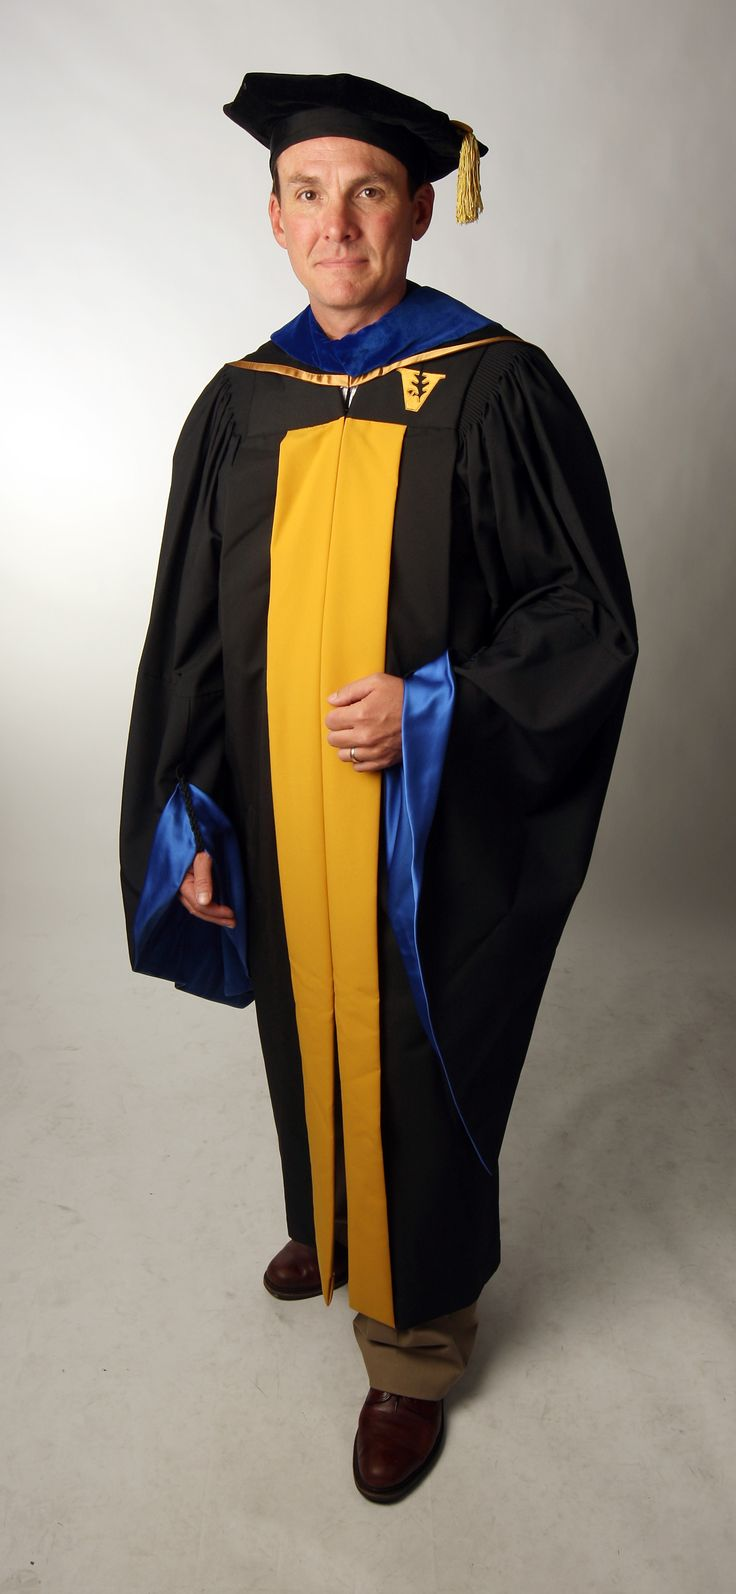 21 best Academic Regalia images on Pinterest | Doctoral regalia ...